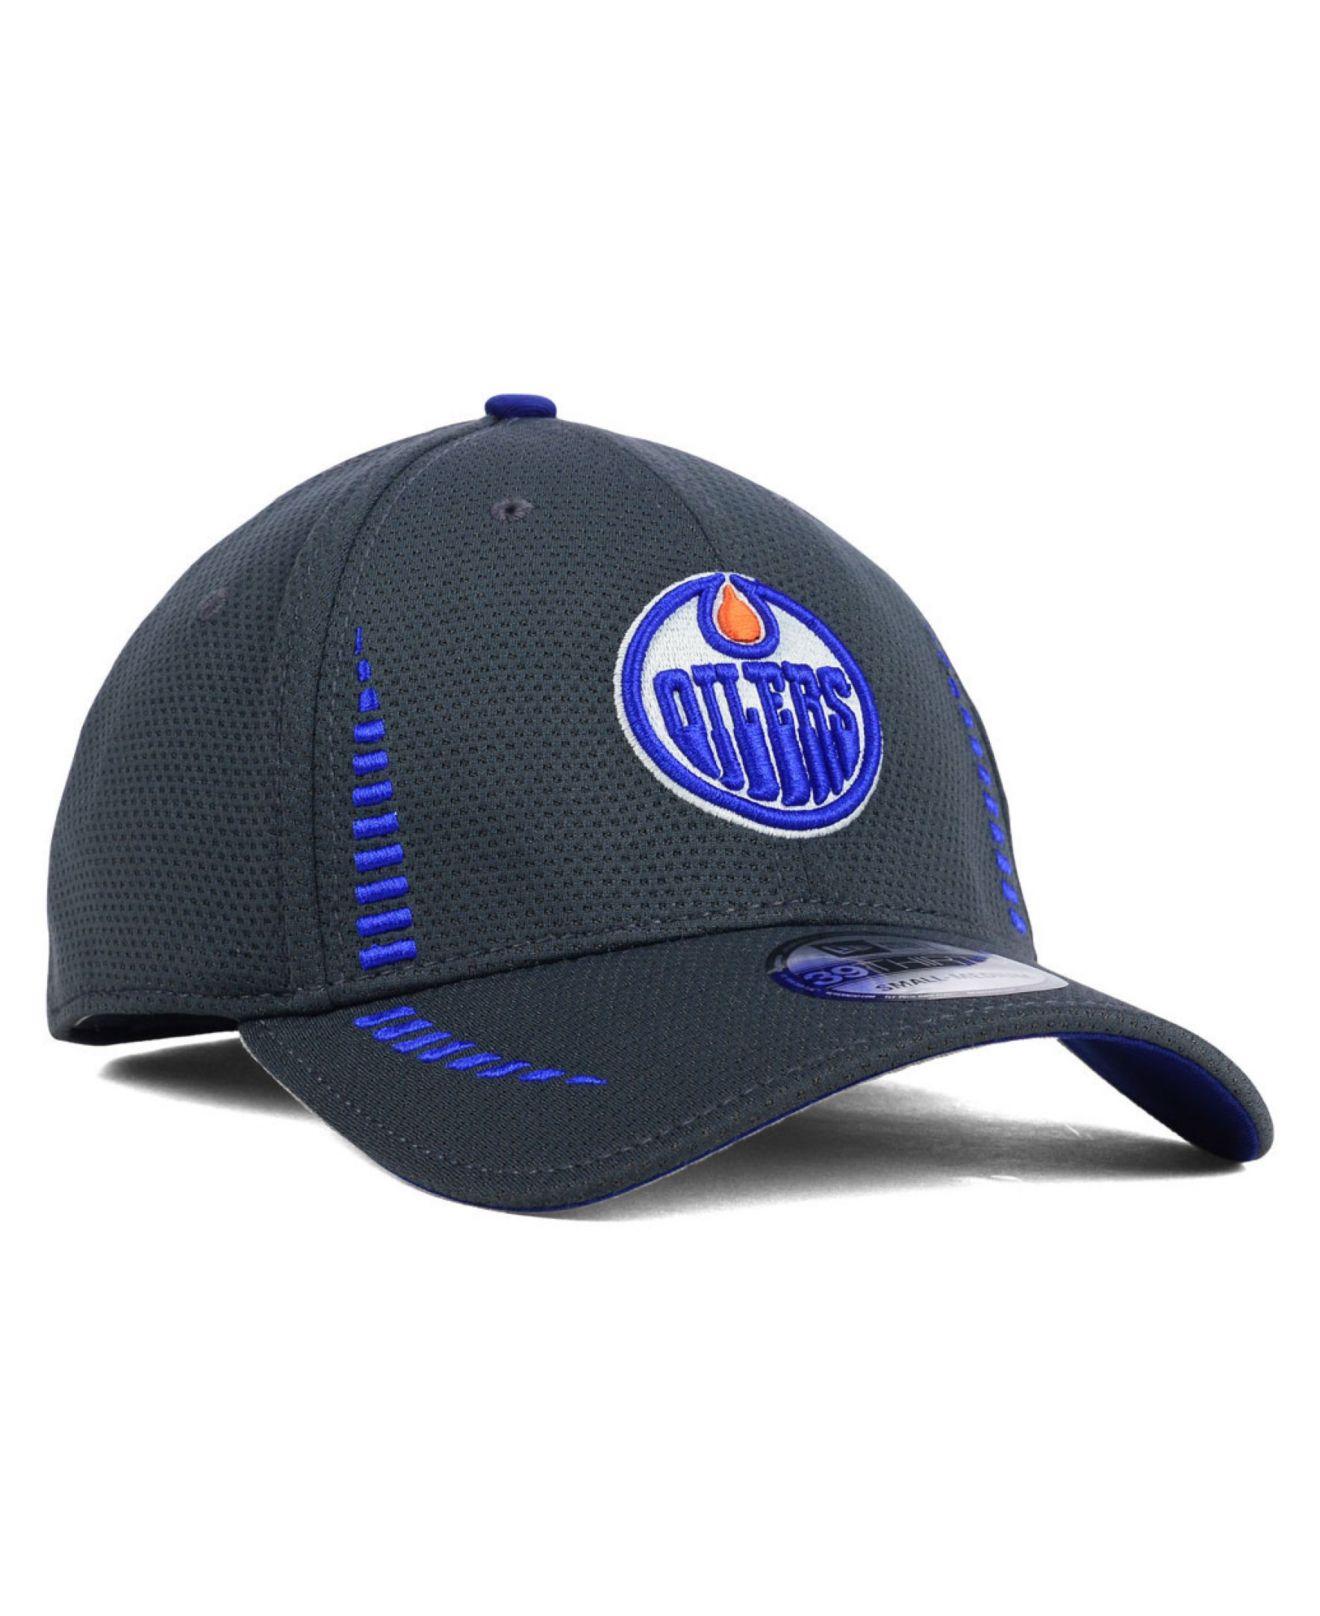 quality design c60b4 3b307 Lyst - KTZ Edmonton Oilers Graphite Training 39thirty Cap in Gray ...